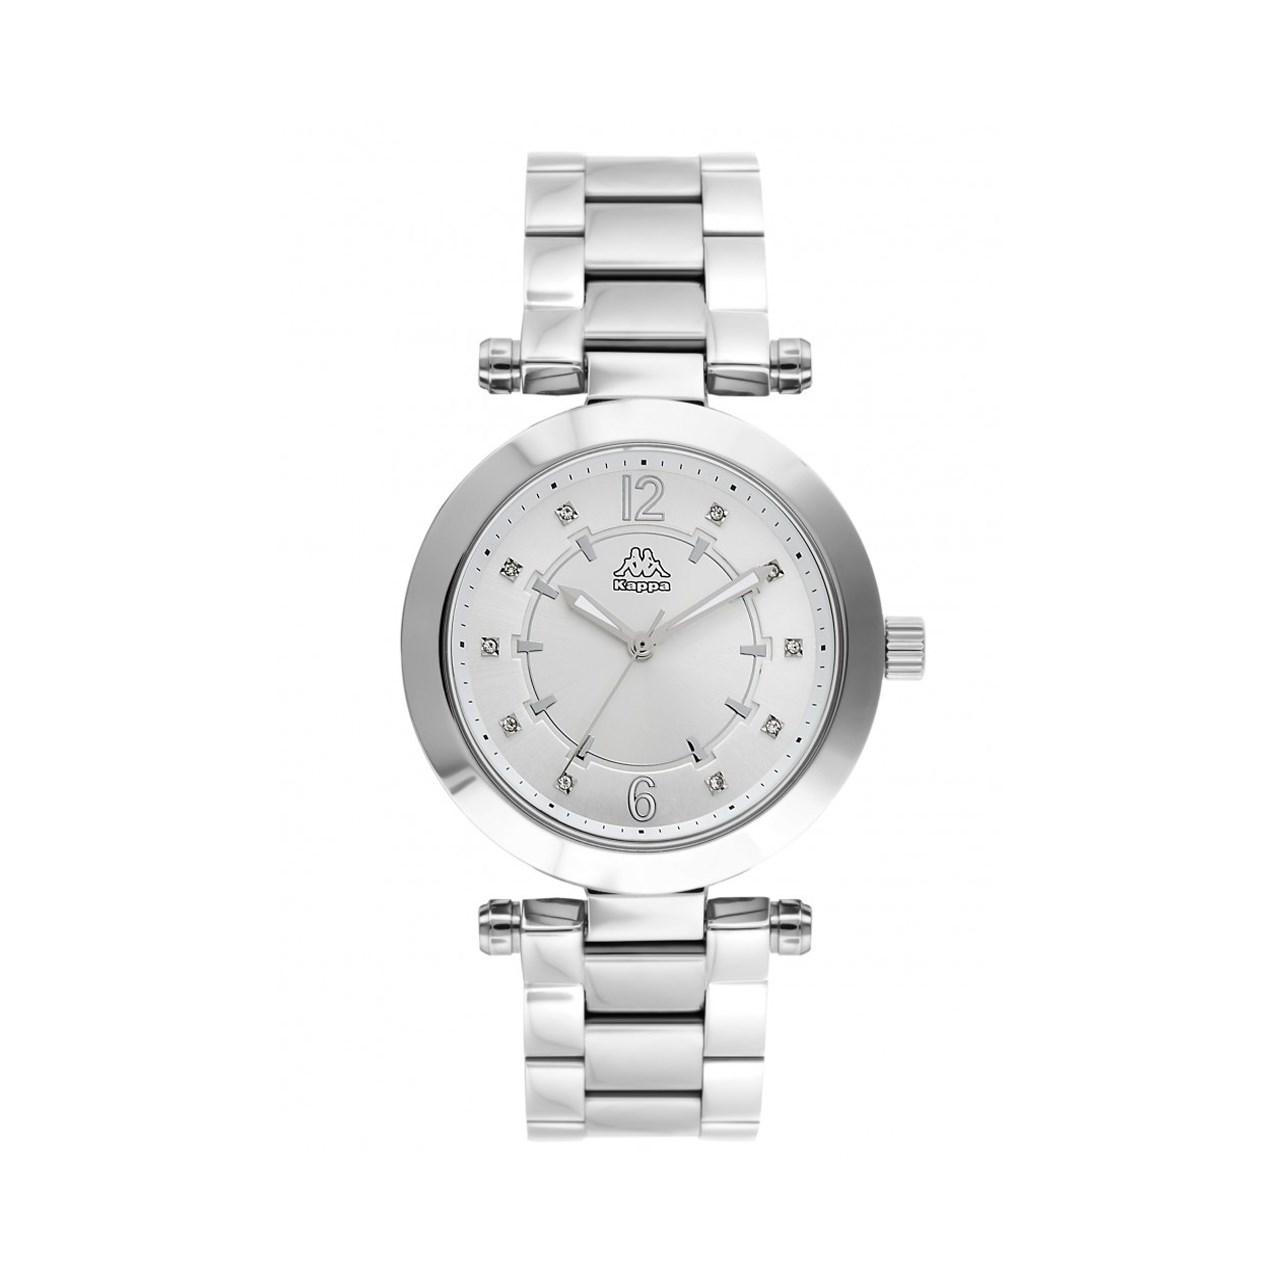 ساعت مچی عقربه ای کاپا مدل 1414L-a